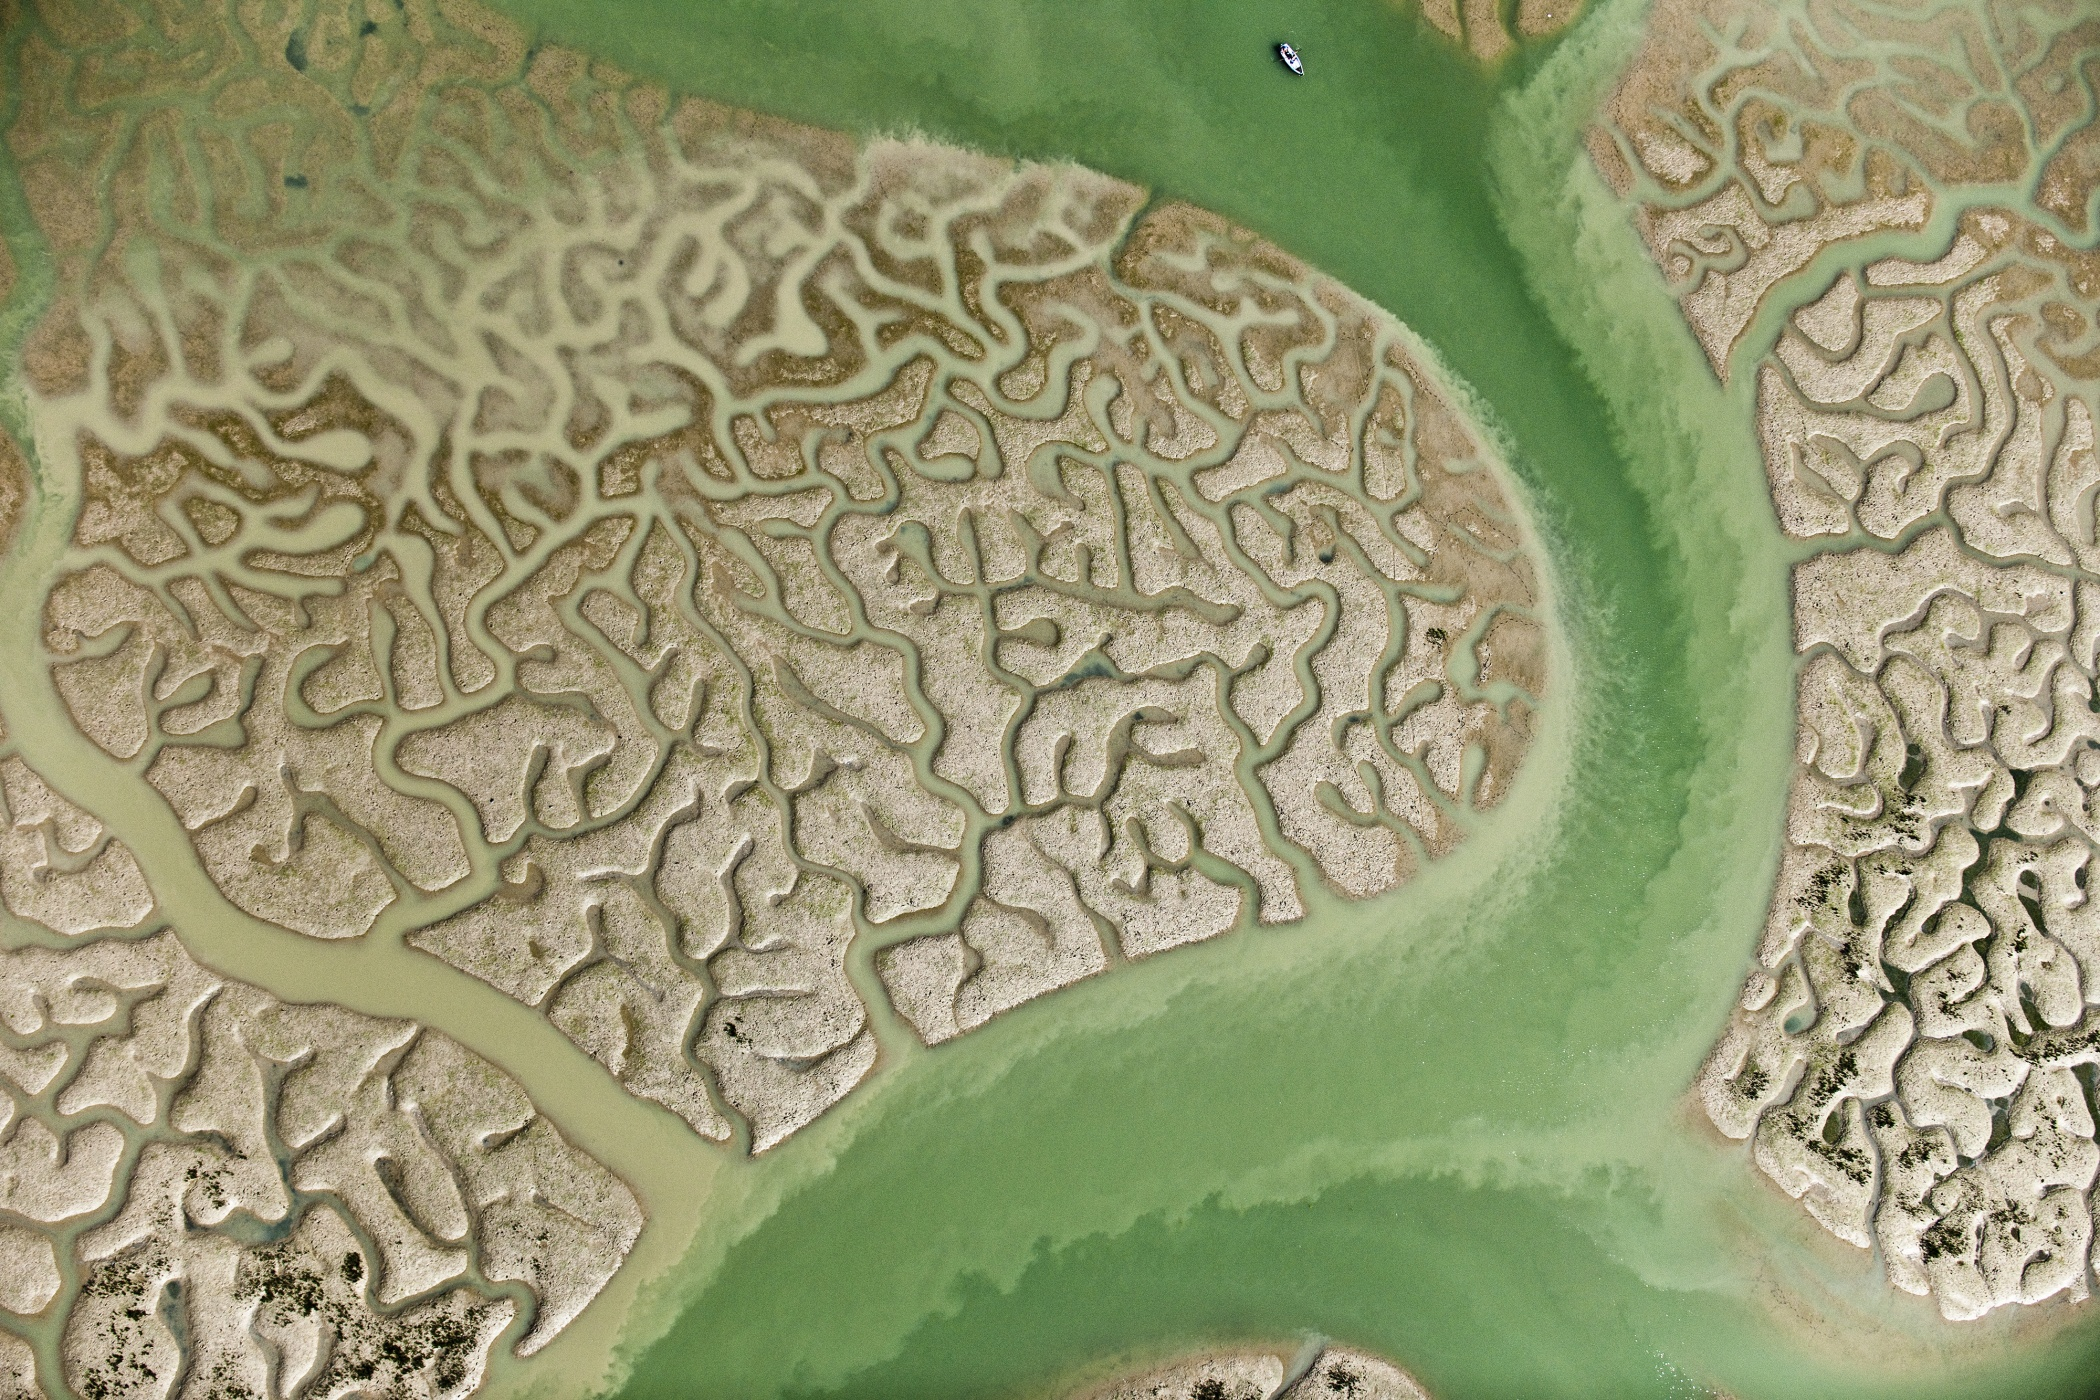 La isla Mínima - Author series 1. Fractals - Hector Garrido, Aerial and human photography